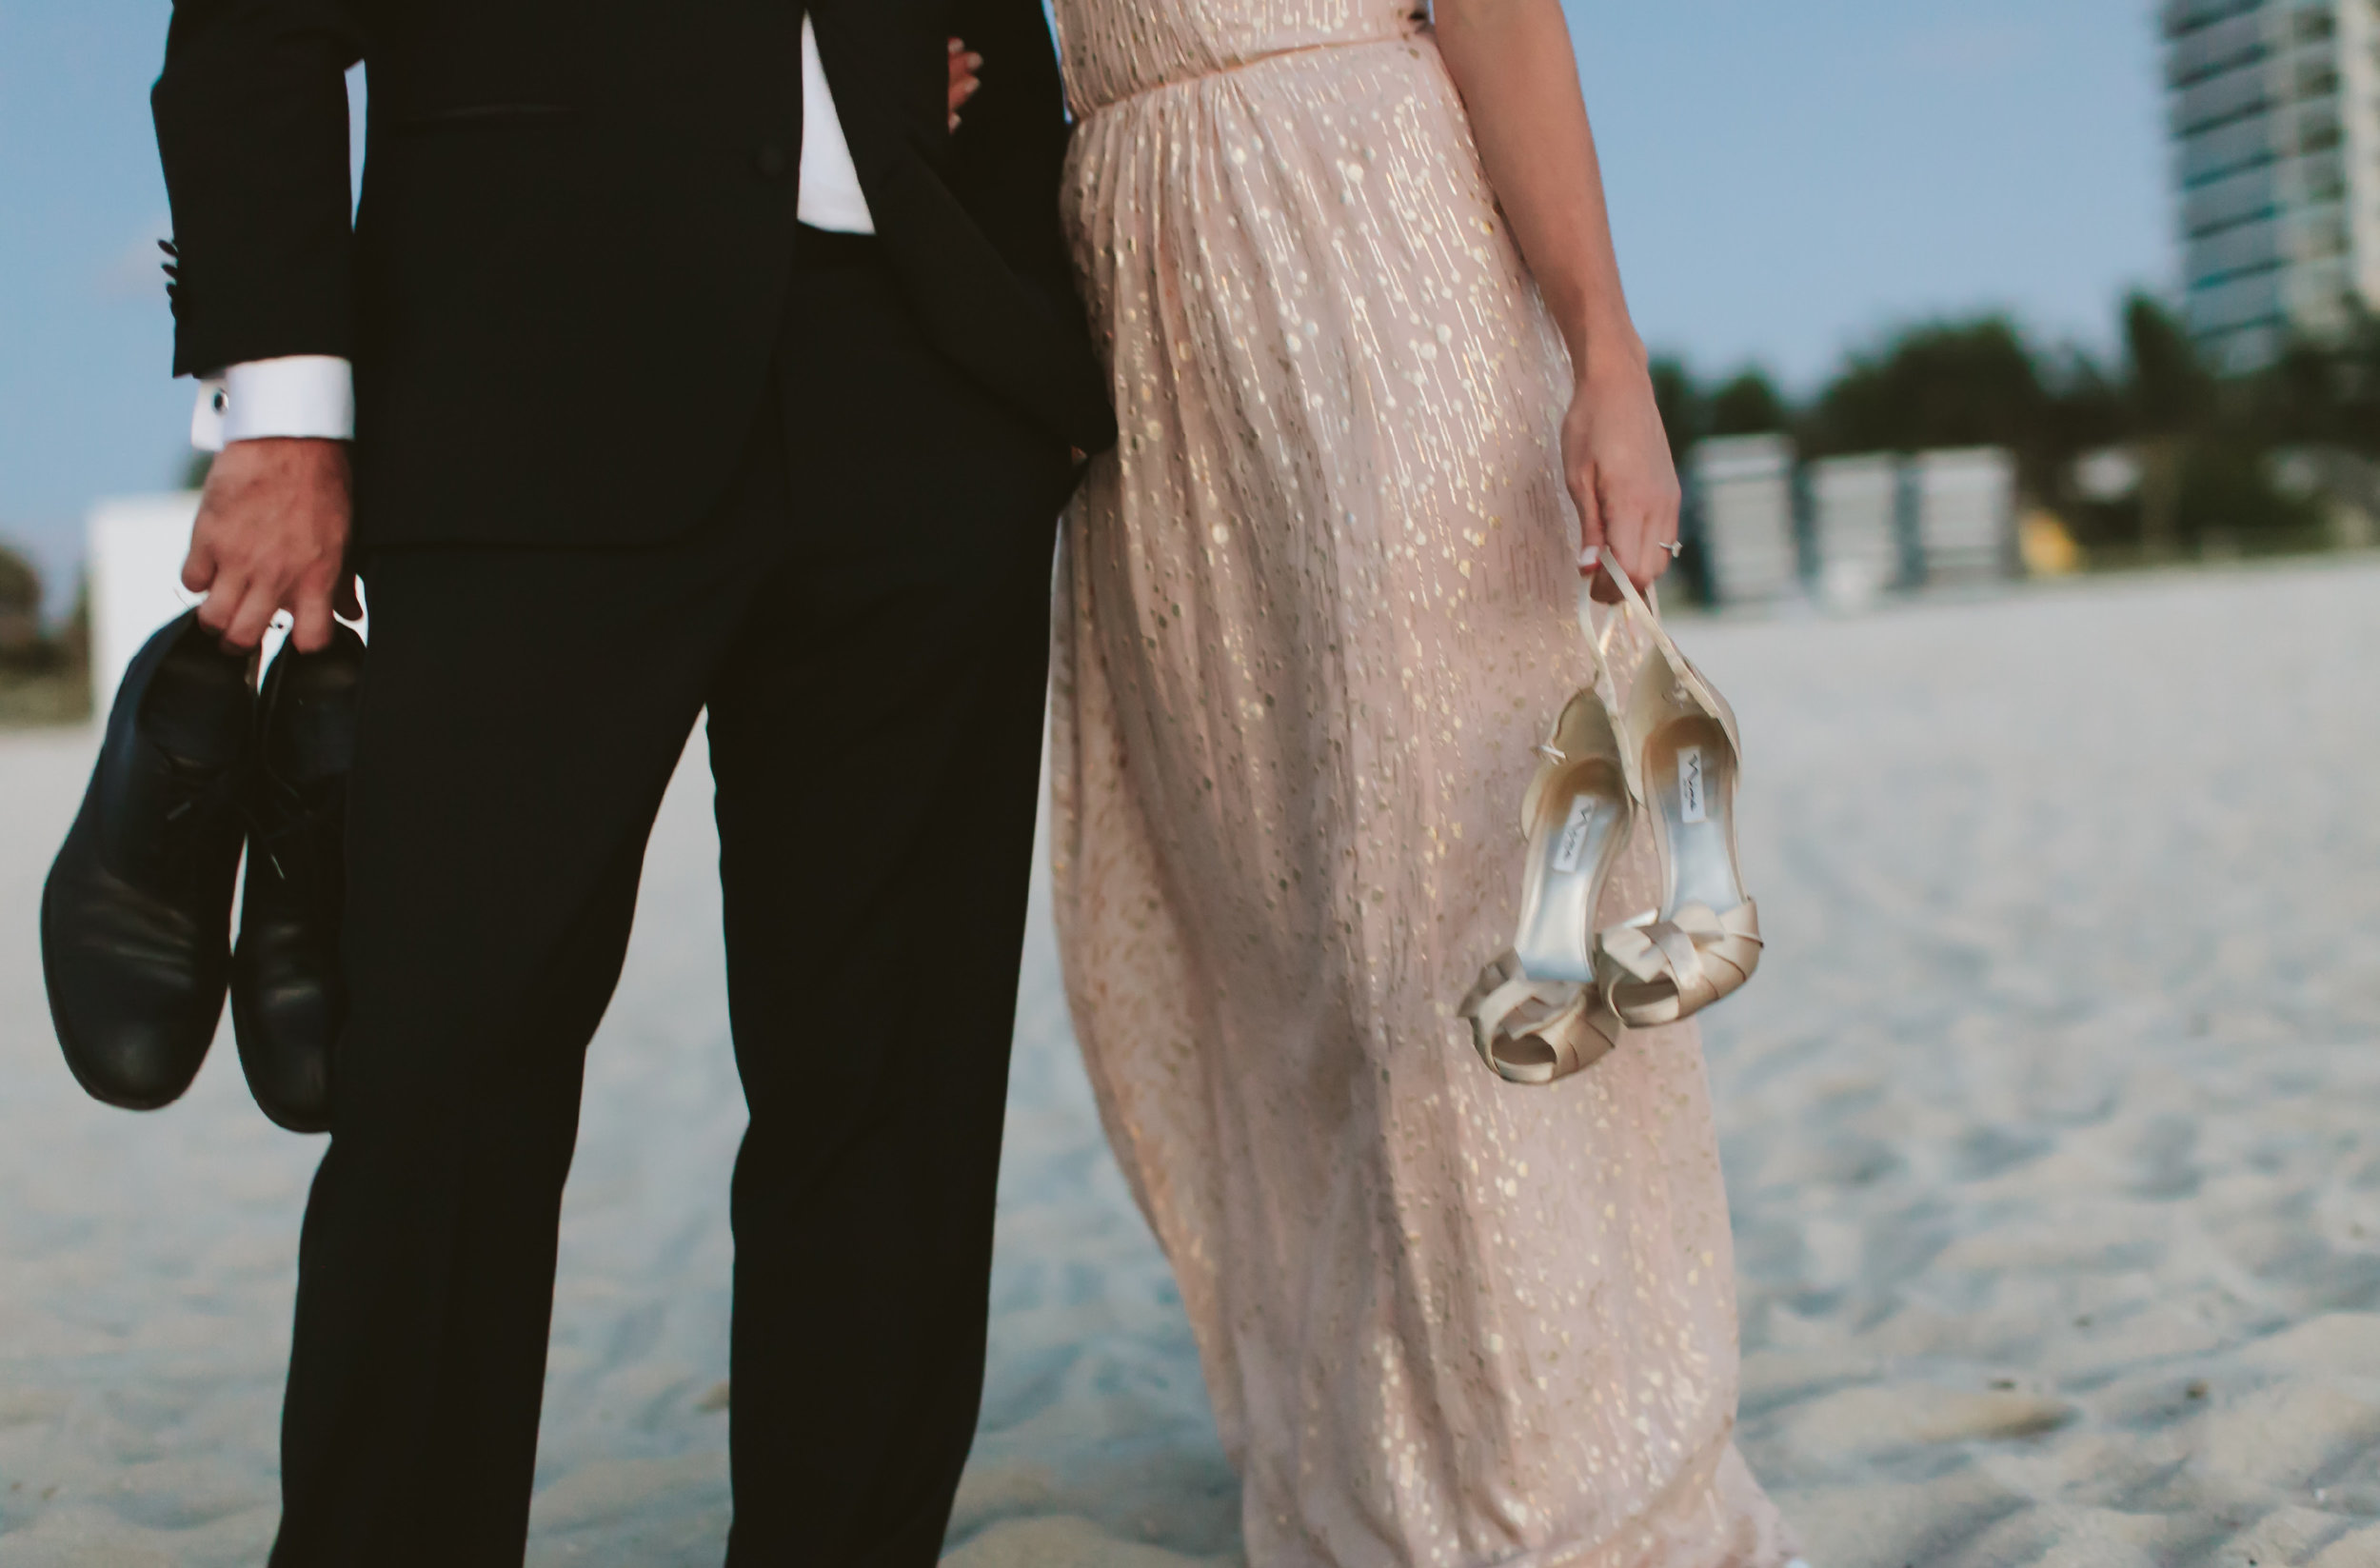 Meli + Mike South Pointe Park South Beach Miami Engagement Shoot4.jpg